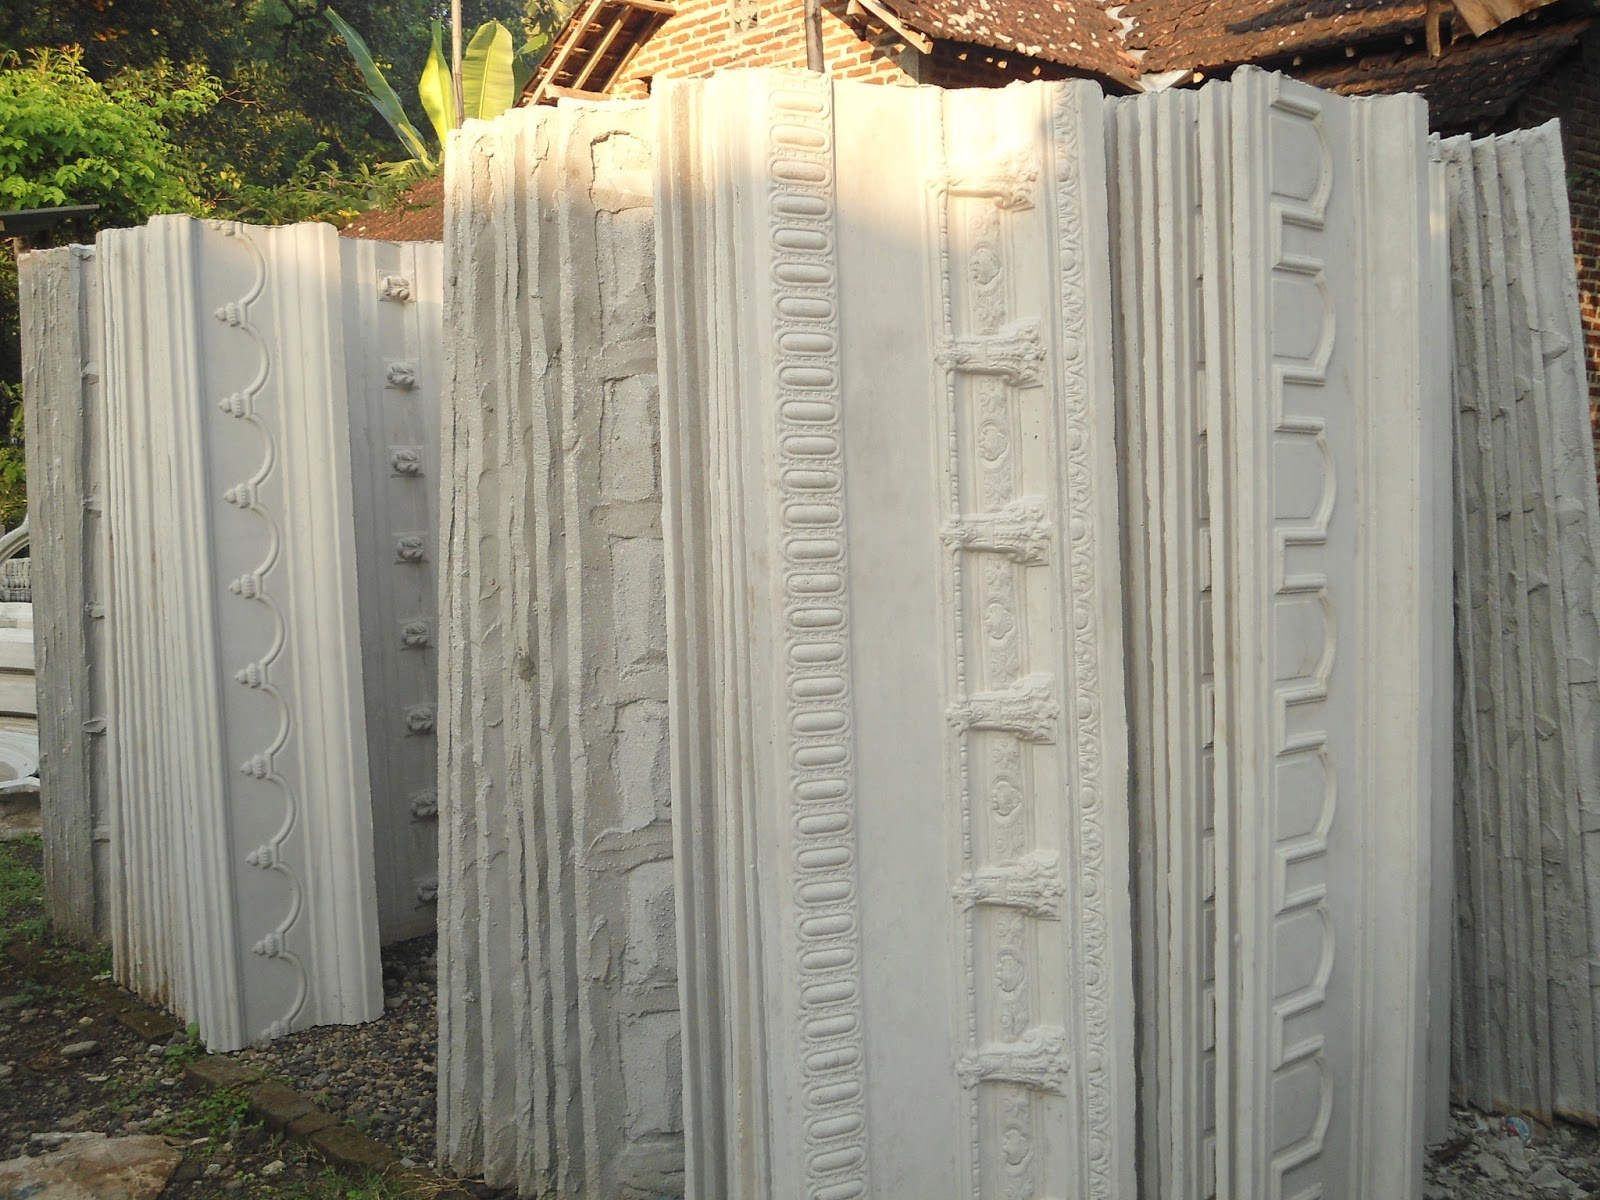 sanjaya profil beton motif listplang cetakan. Black Bedroom Furniture Sets. Home Design Ideas